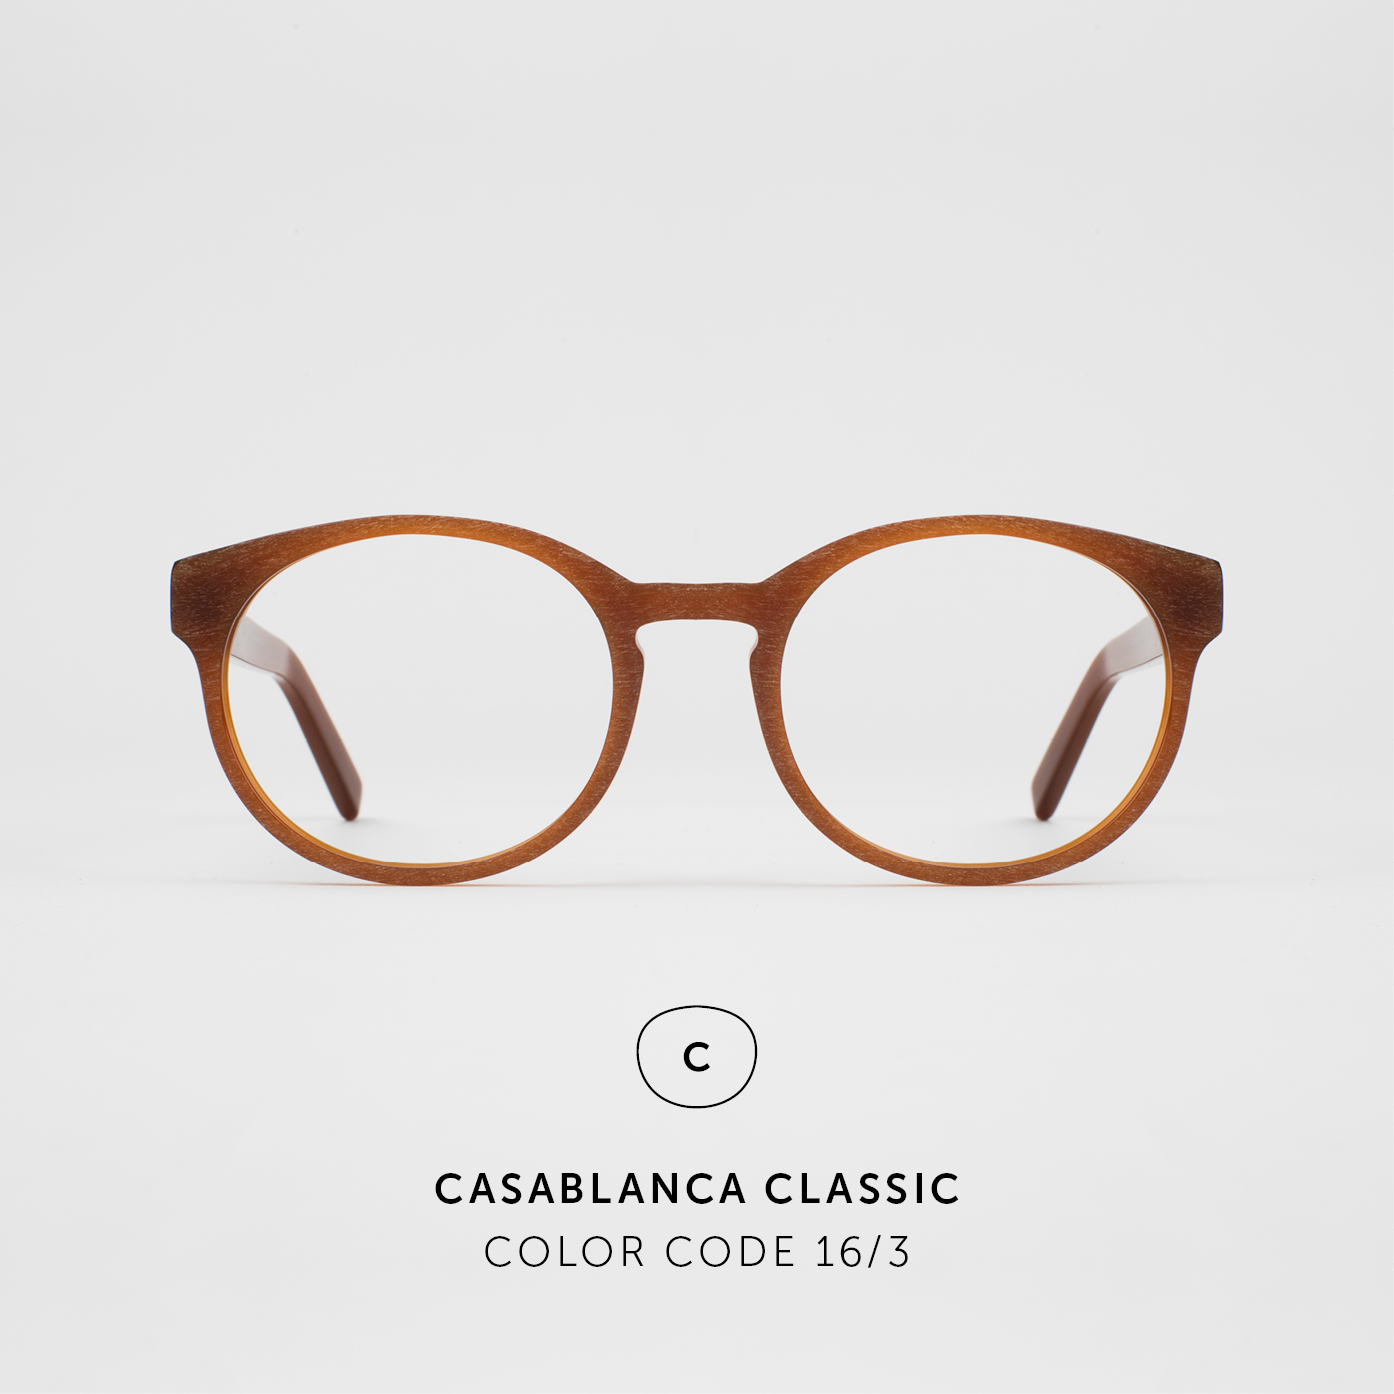 CasablancaClassic45.jpg